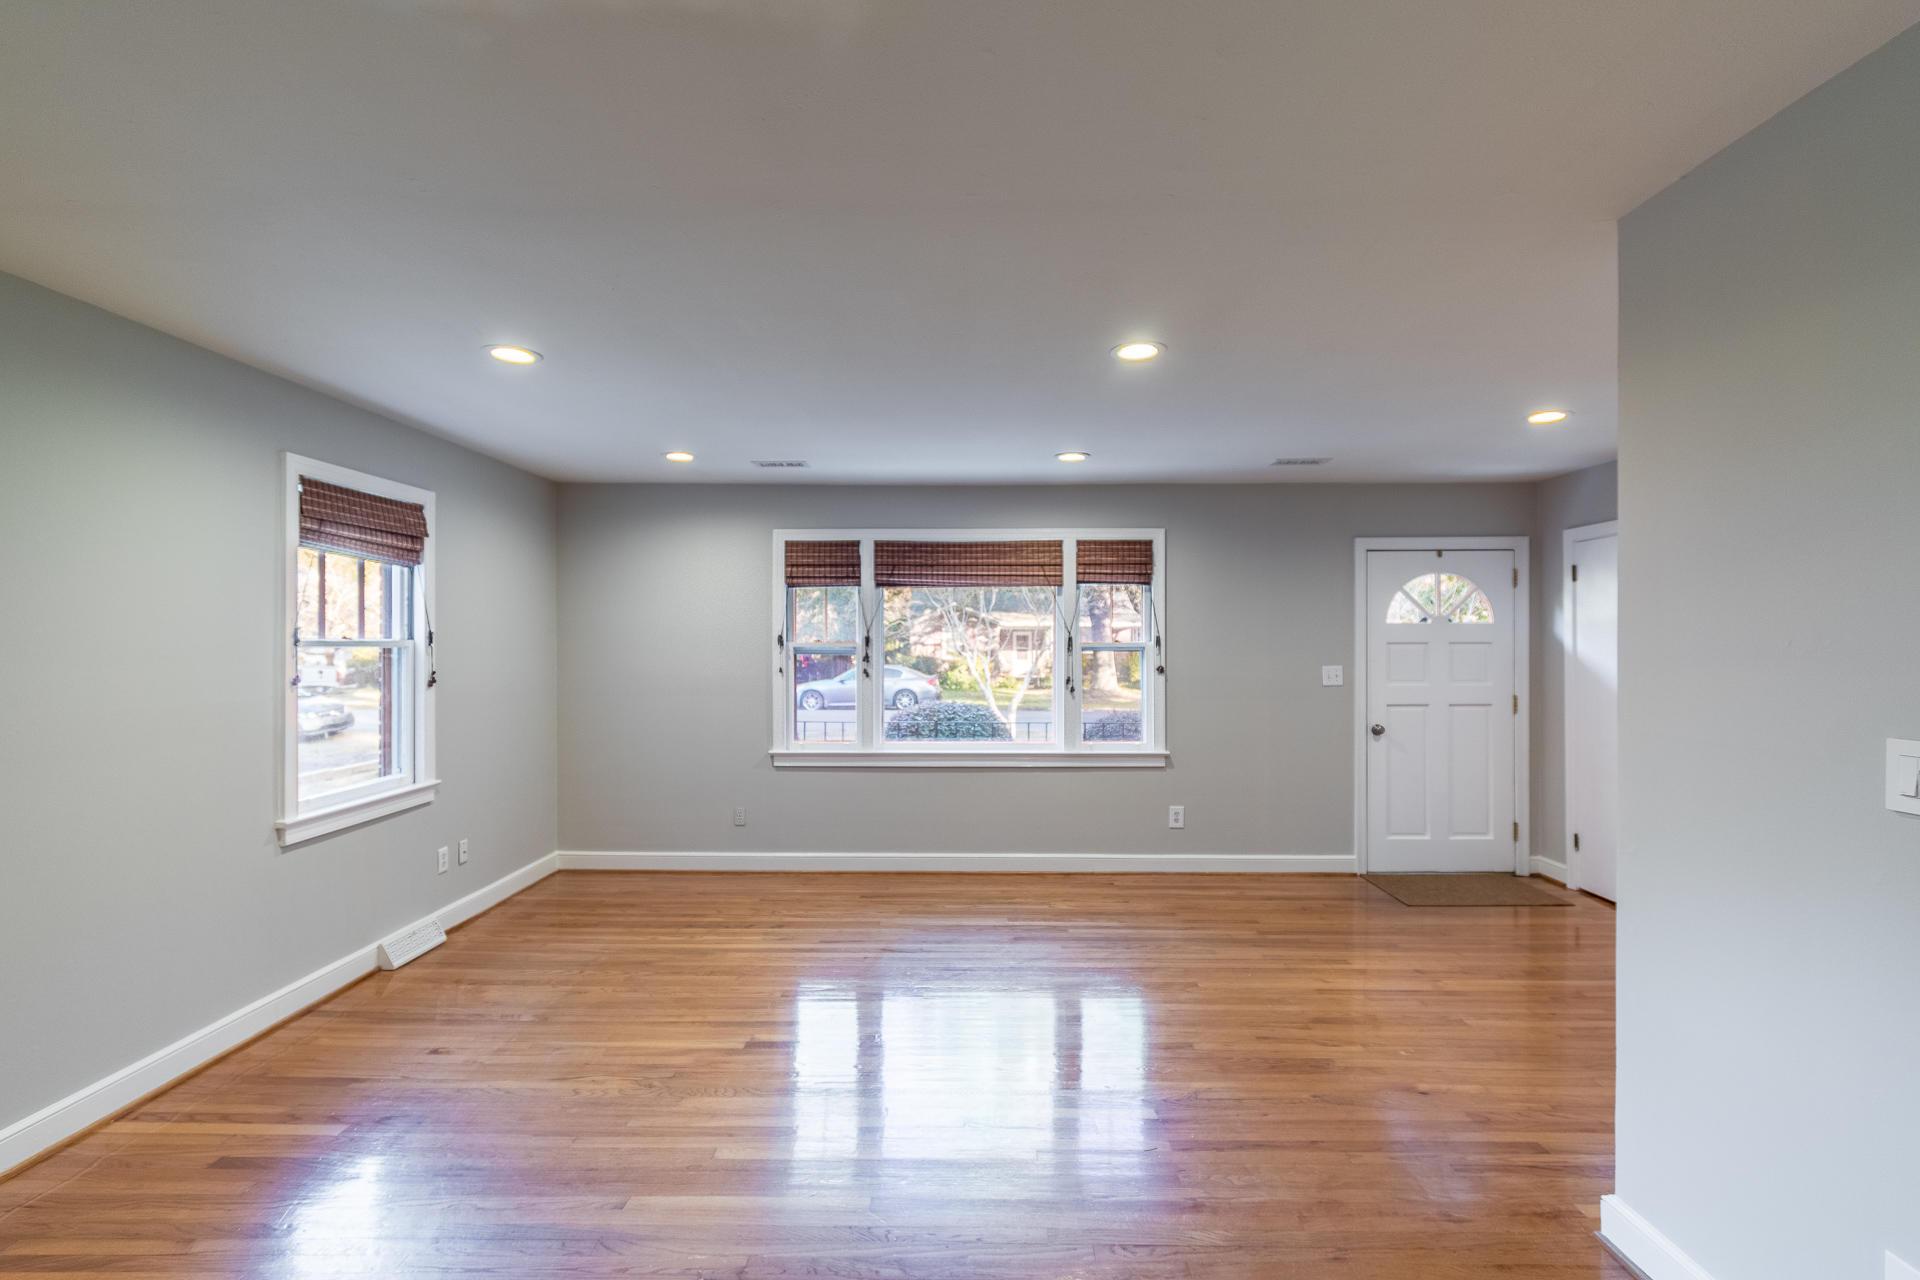 Edgewood Gardens Homes For Sale - 507 Risher, Charleston, SC - 16